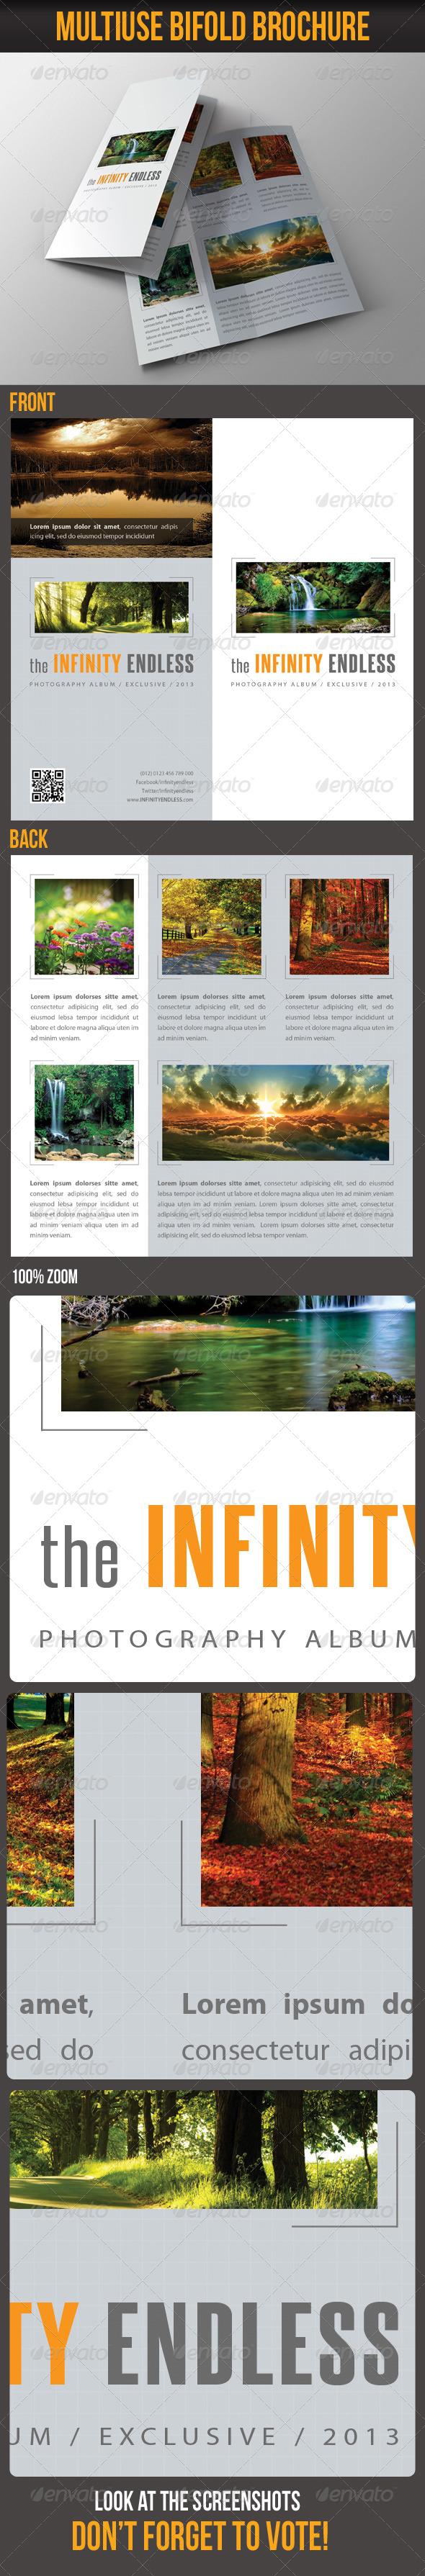 Multiuse Bifold Brochure 07 - Portfolio Brochures